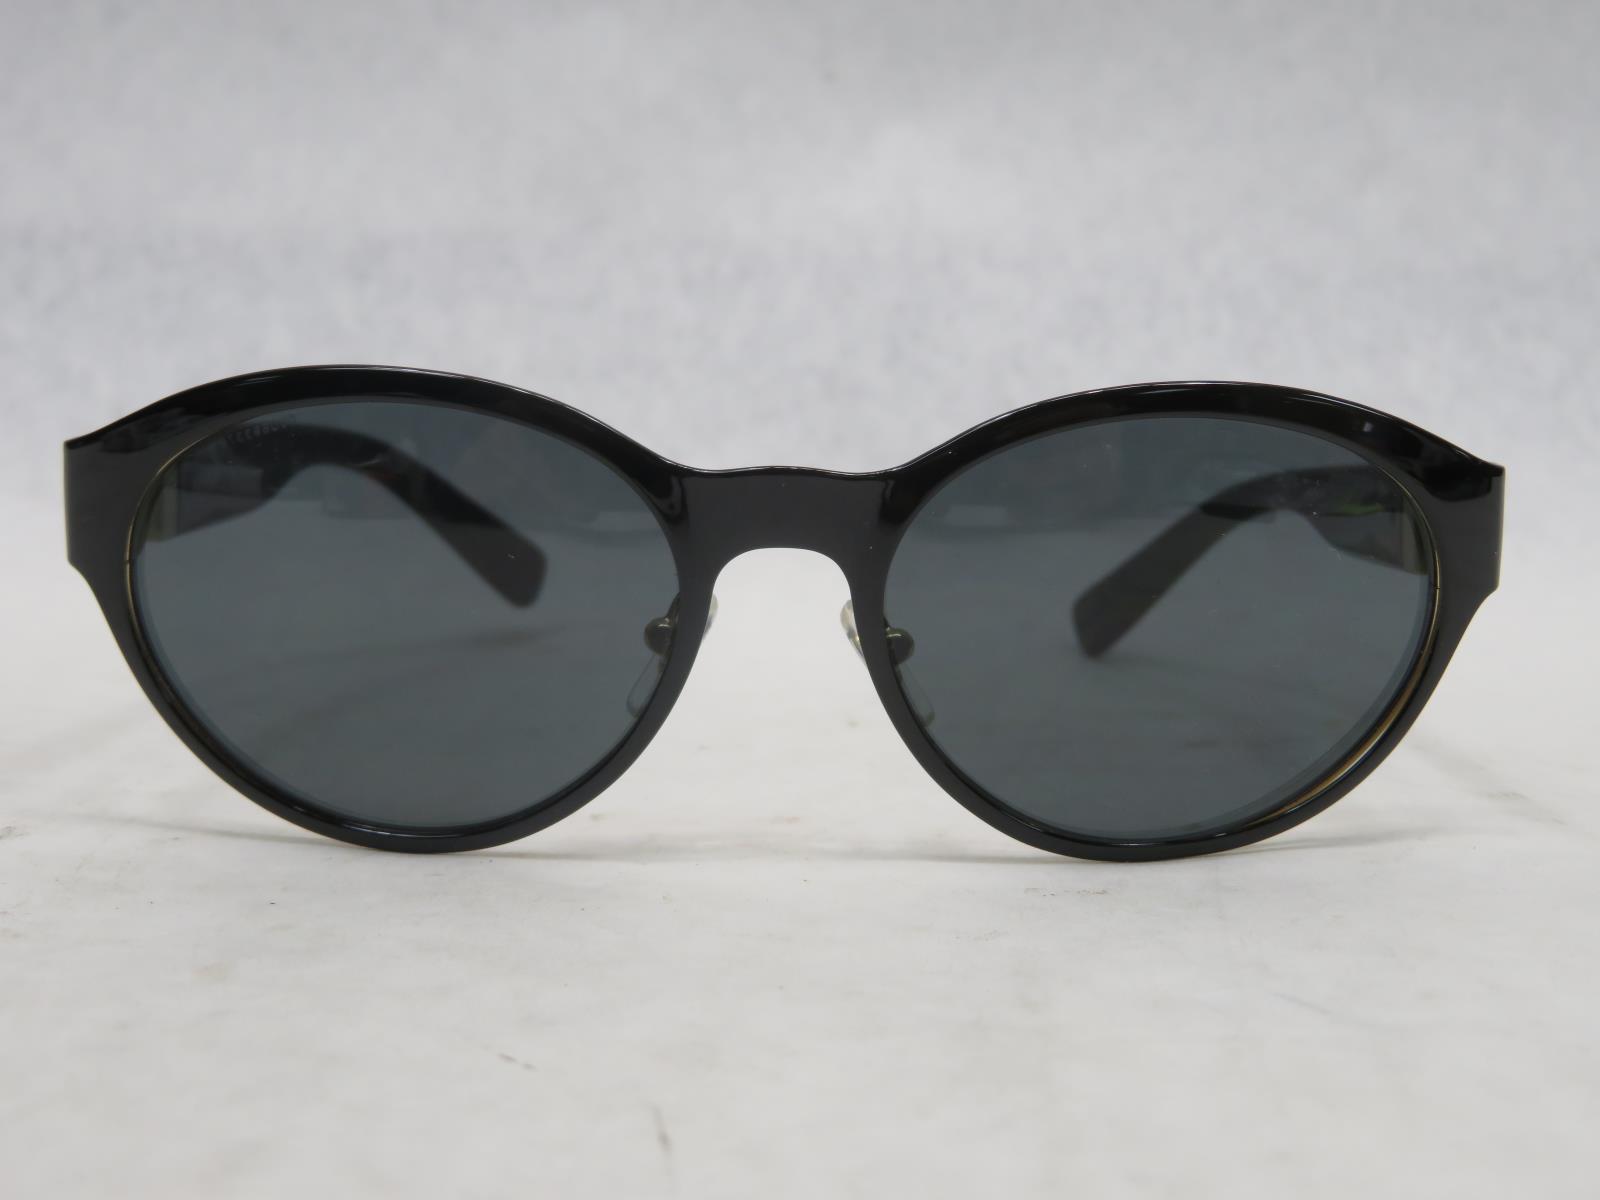 b5b1459824d Versace Mod 2179 Sunglasses 5.5